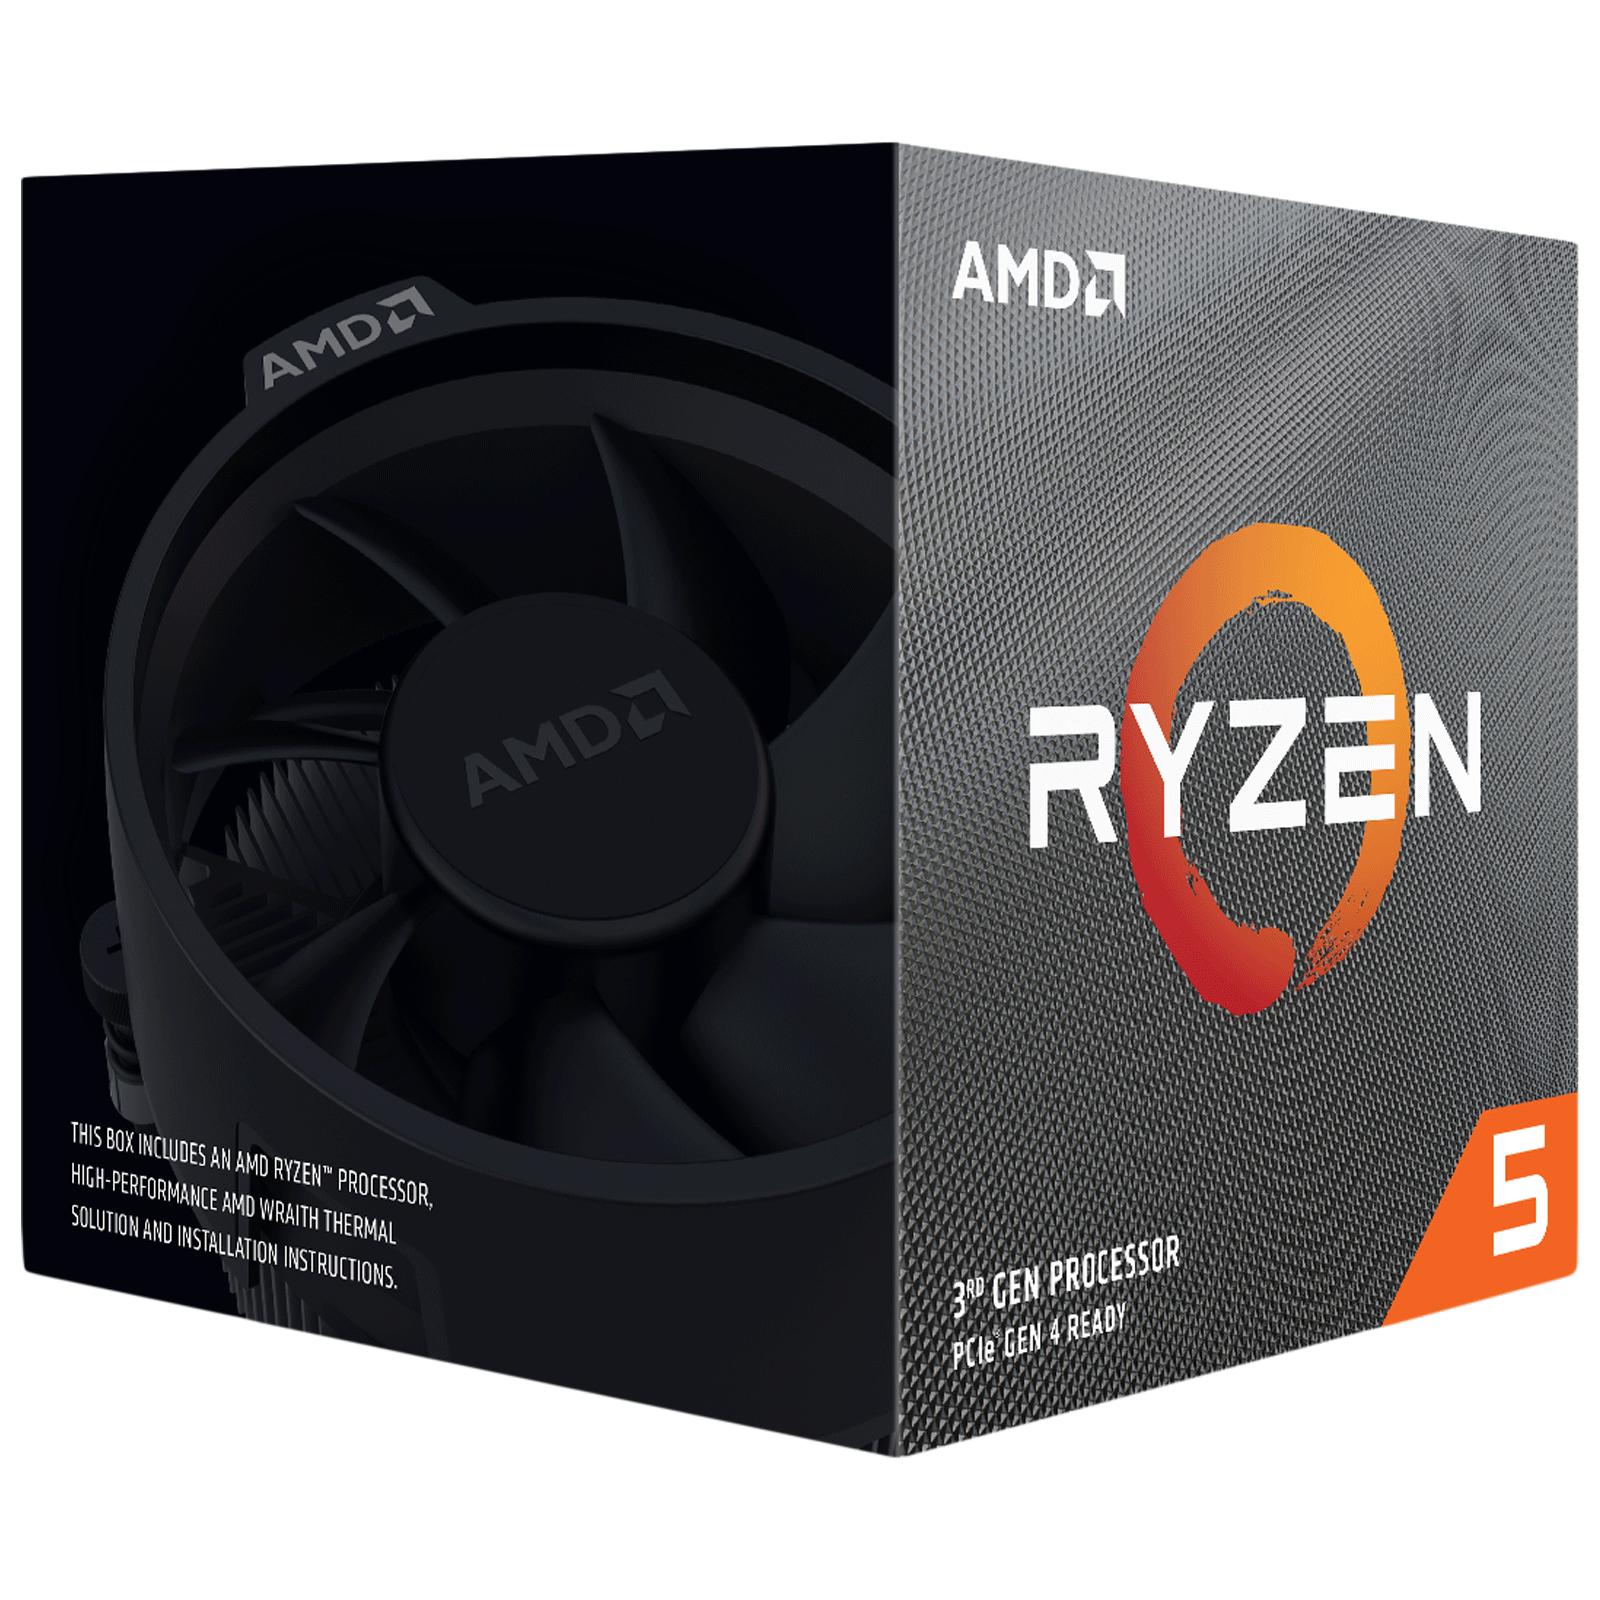 AMD Ryzen 5 Desktop Processor (6 Cores, 3.8 GHz, AMD Zen Core Architecture, 3600XT, Silver)_1